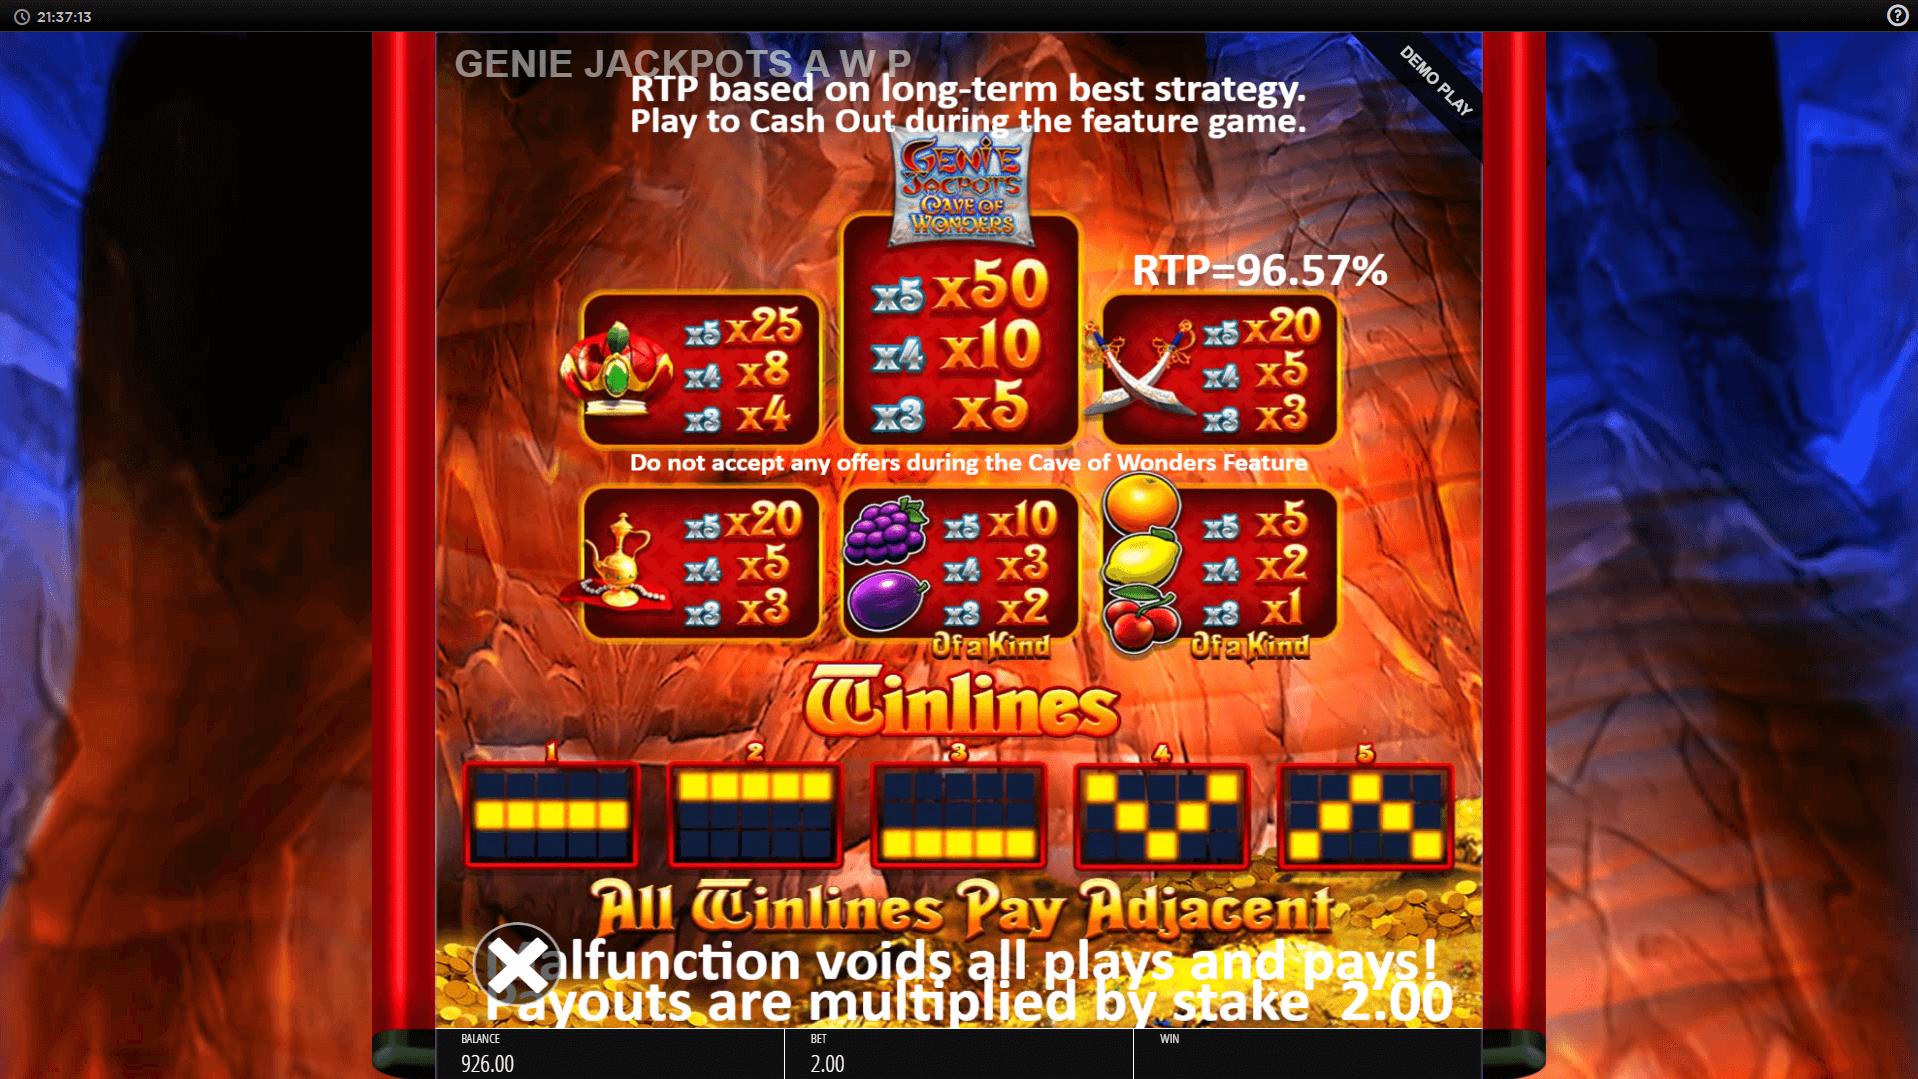 Genie Jackpots Cave Of Wonders Slot Machine